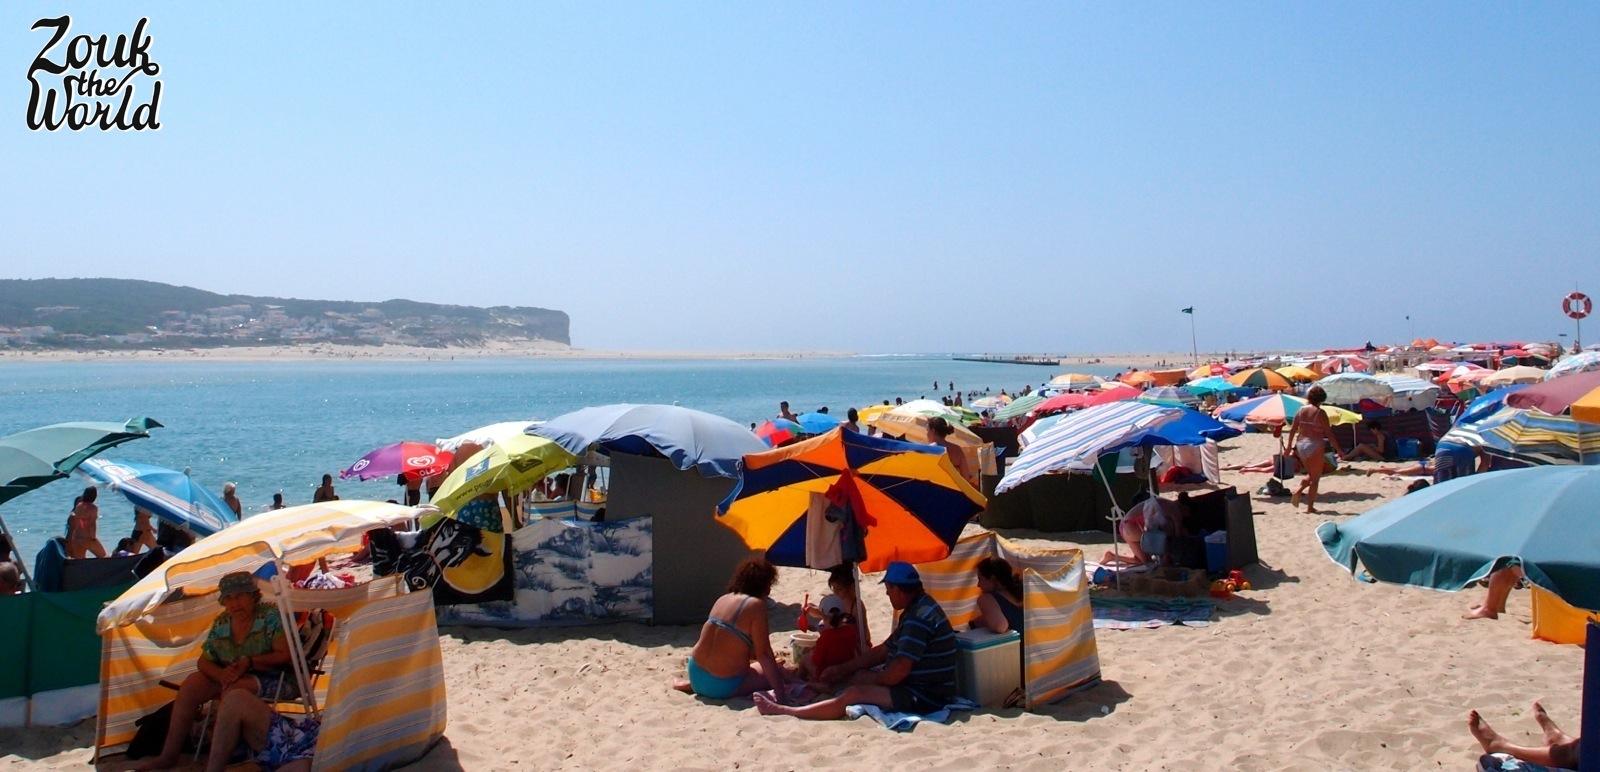 Foz do Arelho, THE northern shore of the lagoon, the POINT WHERE THE LAGOON MEETS THE ATLANTIC